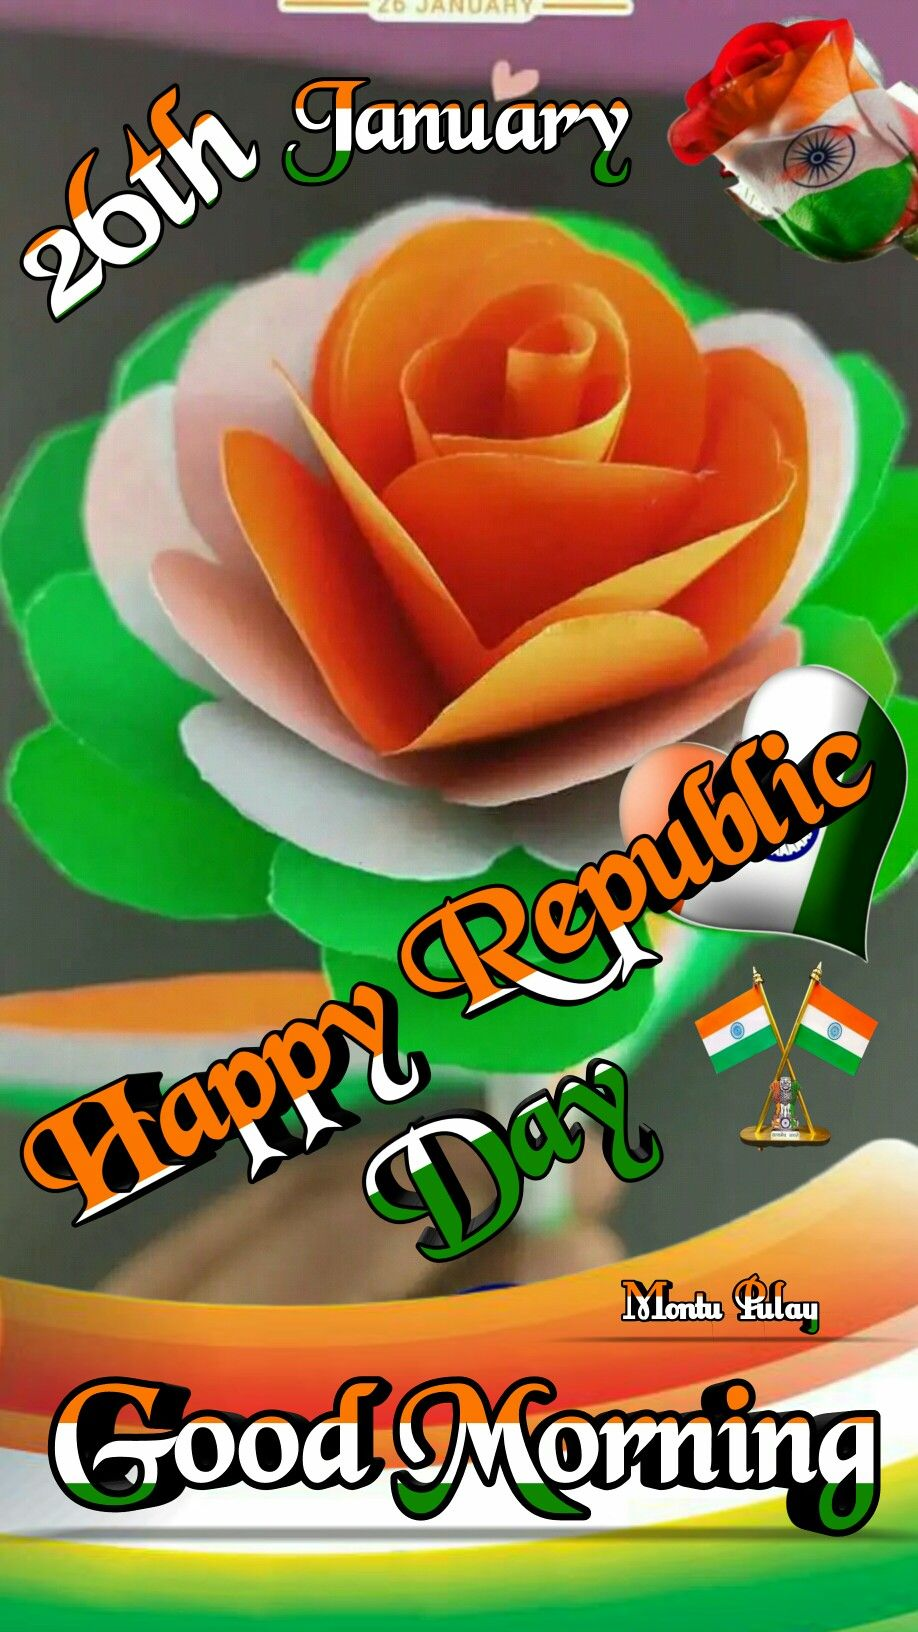 Good Morning Good Morning Flowers Gif Republic Day Good Morning Flowers Gif good morning happy republic day